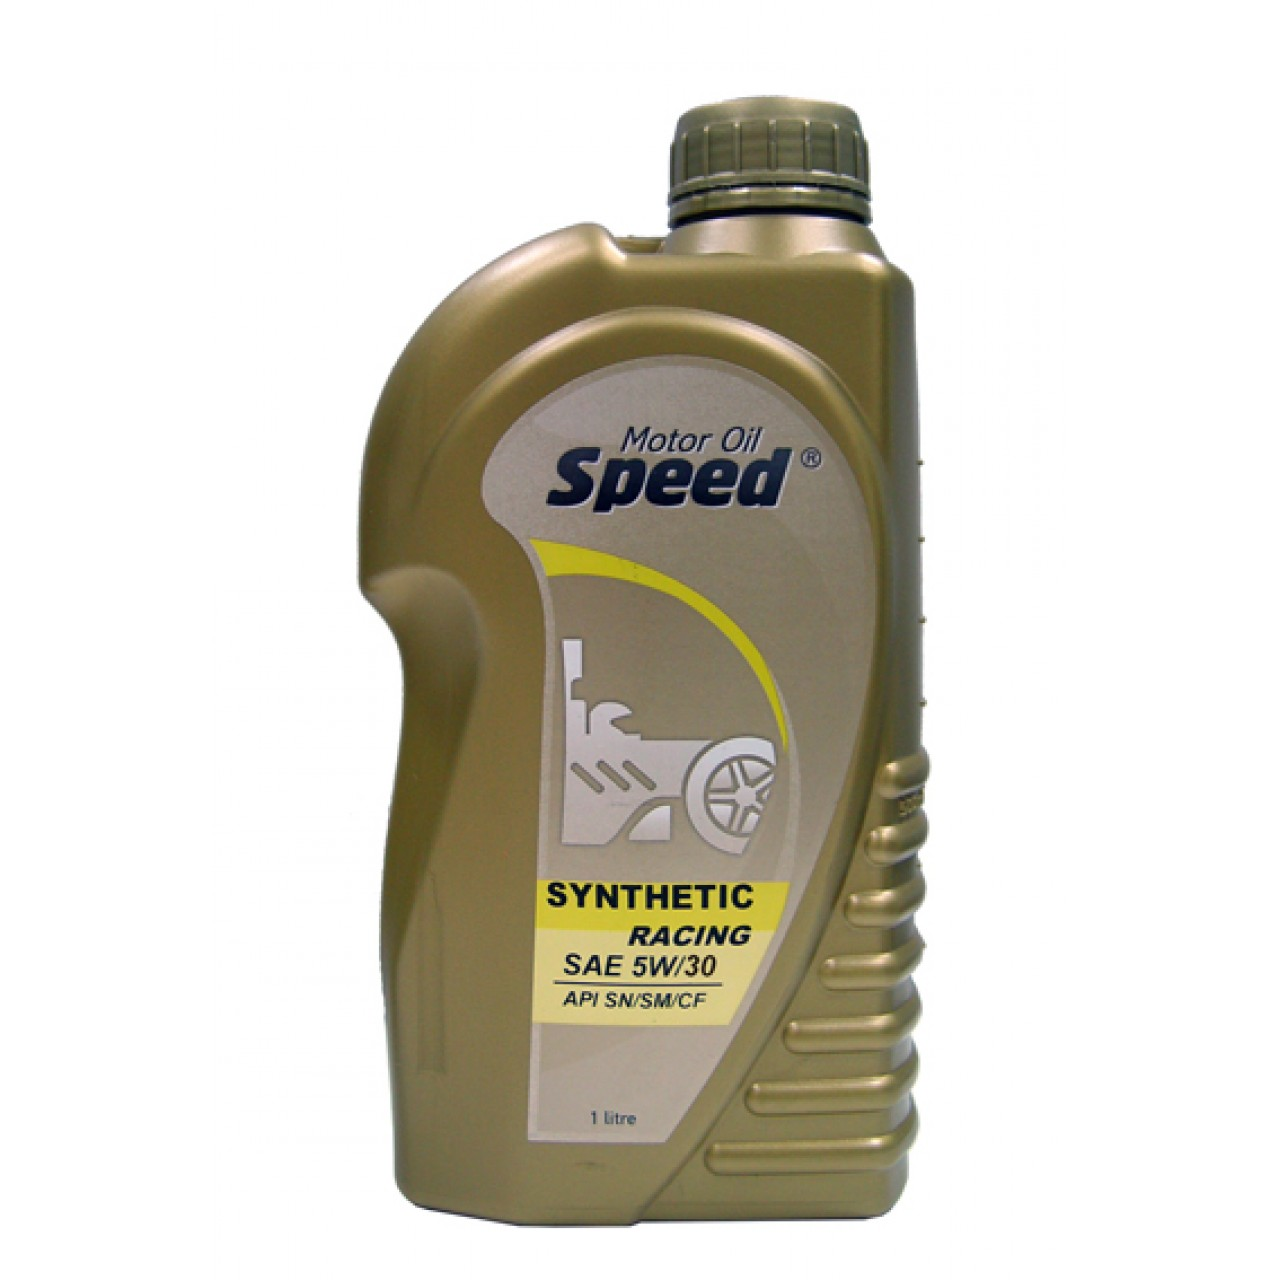 SPEED MOTOR OIL